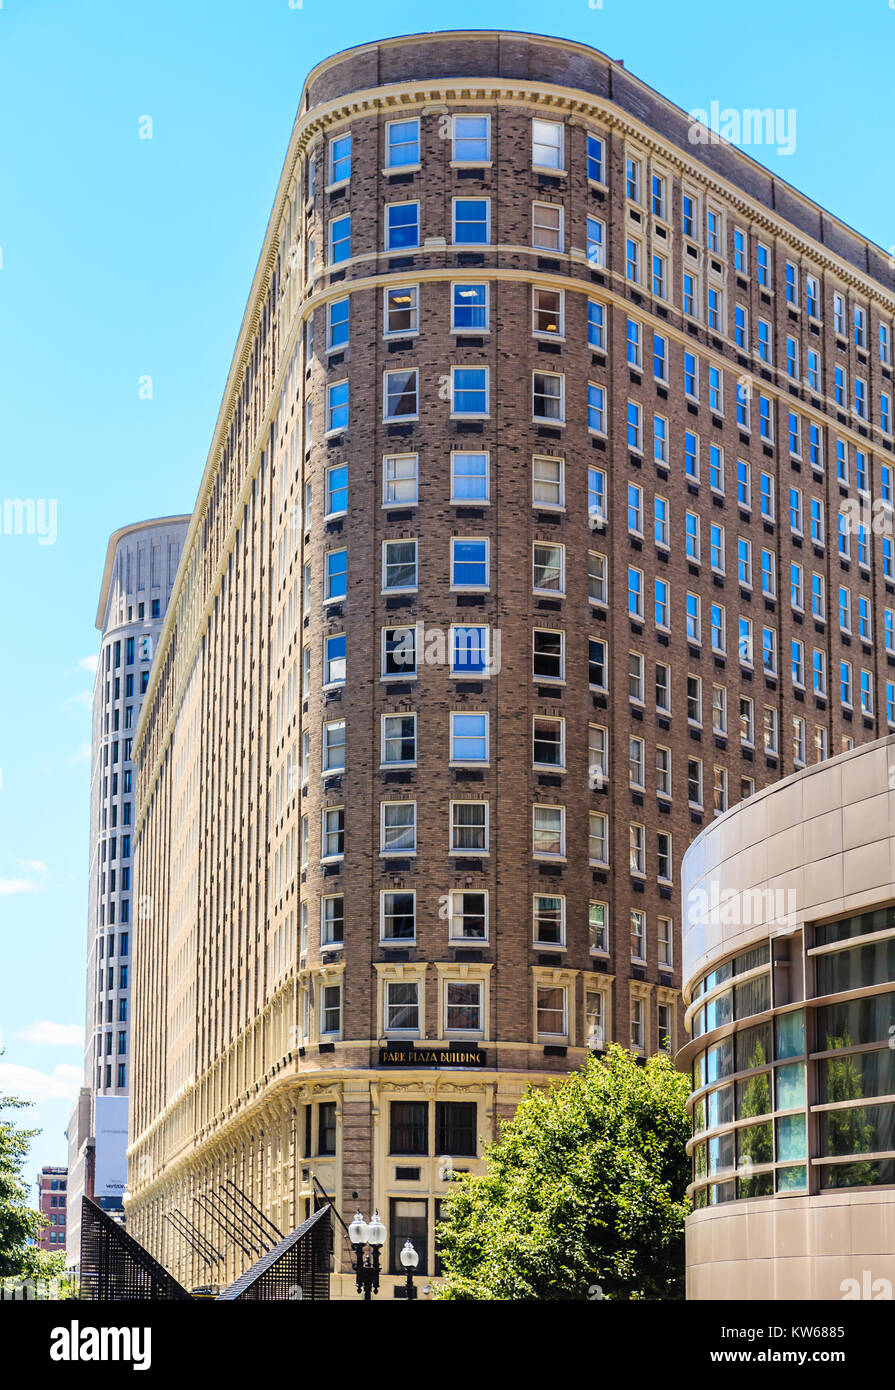 An Old Flatiron Style Building in Boston Massachussetts - Stock Image